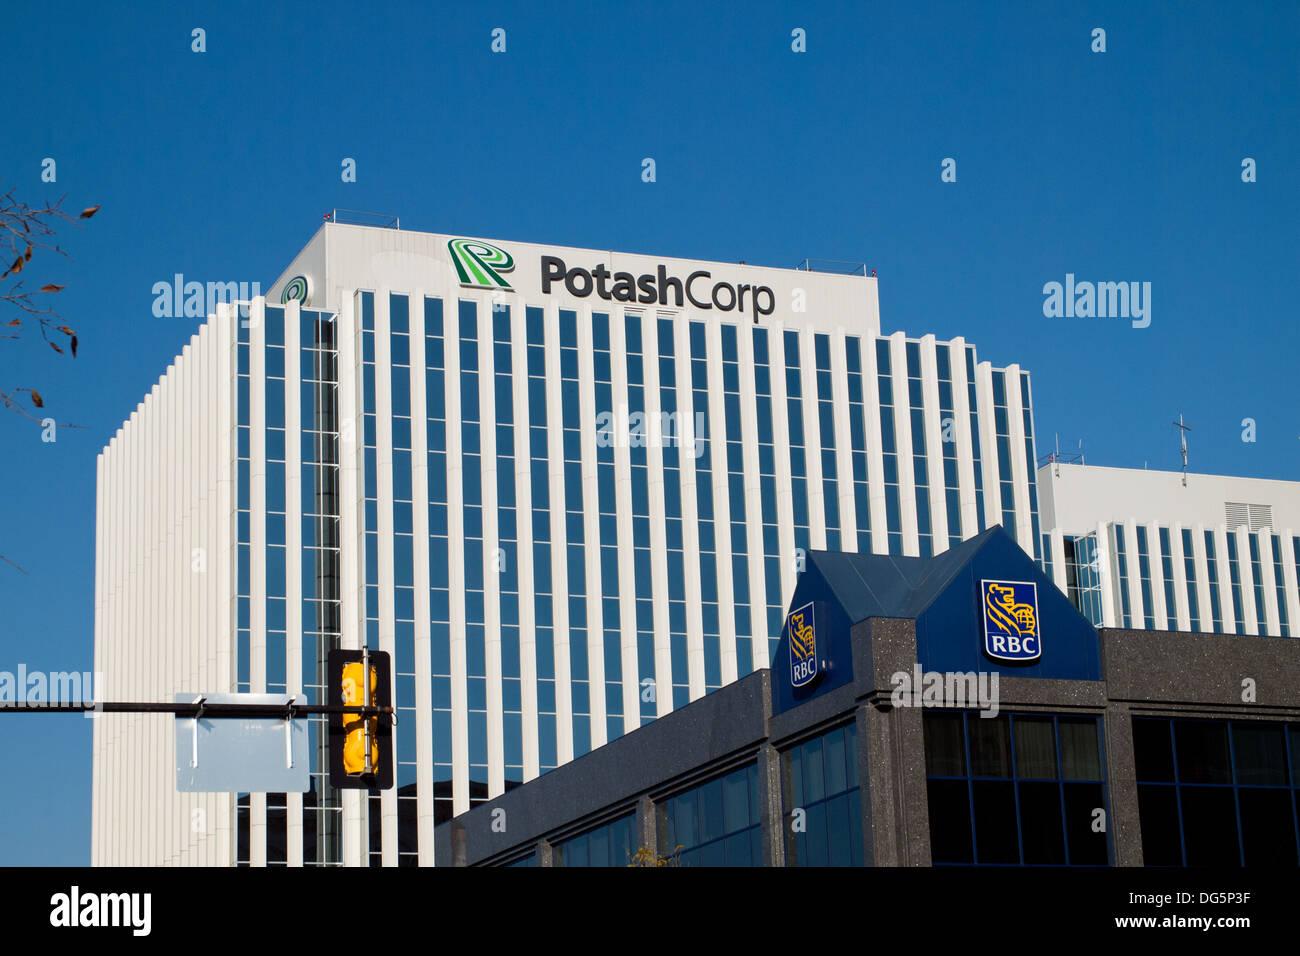 The Canadian corporate headquarters of the Potash Corporation of Saskatchewan (PotashCorp) in Saskatoon, Saskatchewan, Canada. - Stock Image